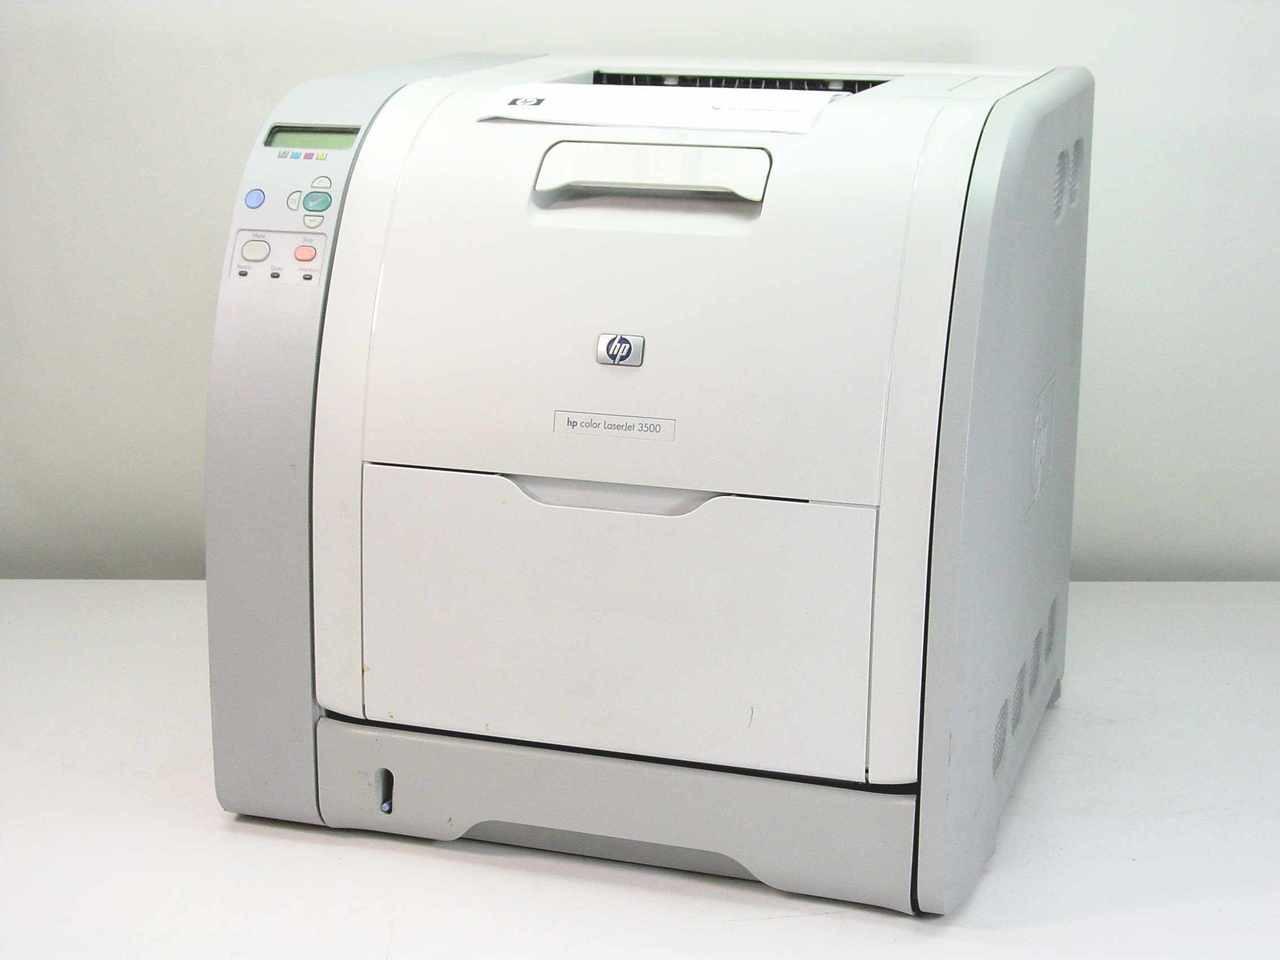 Hewlett Packard Q1319A Color LaserJet 3500 ...